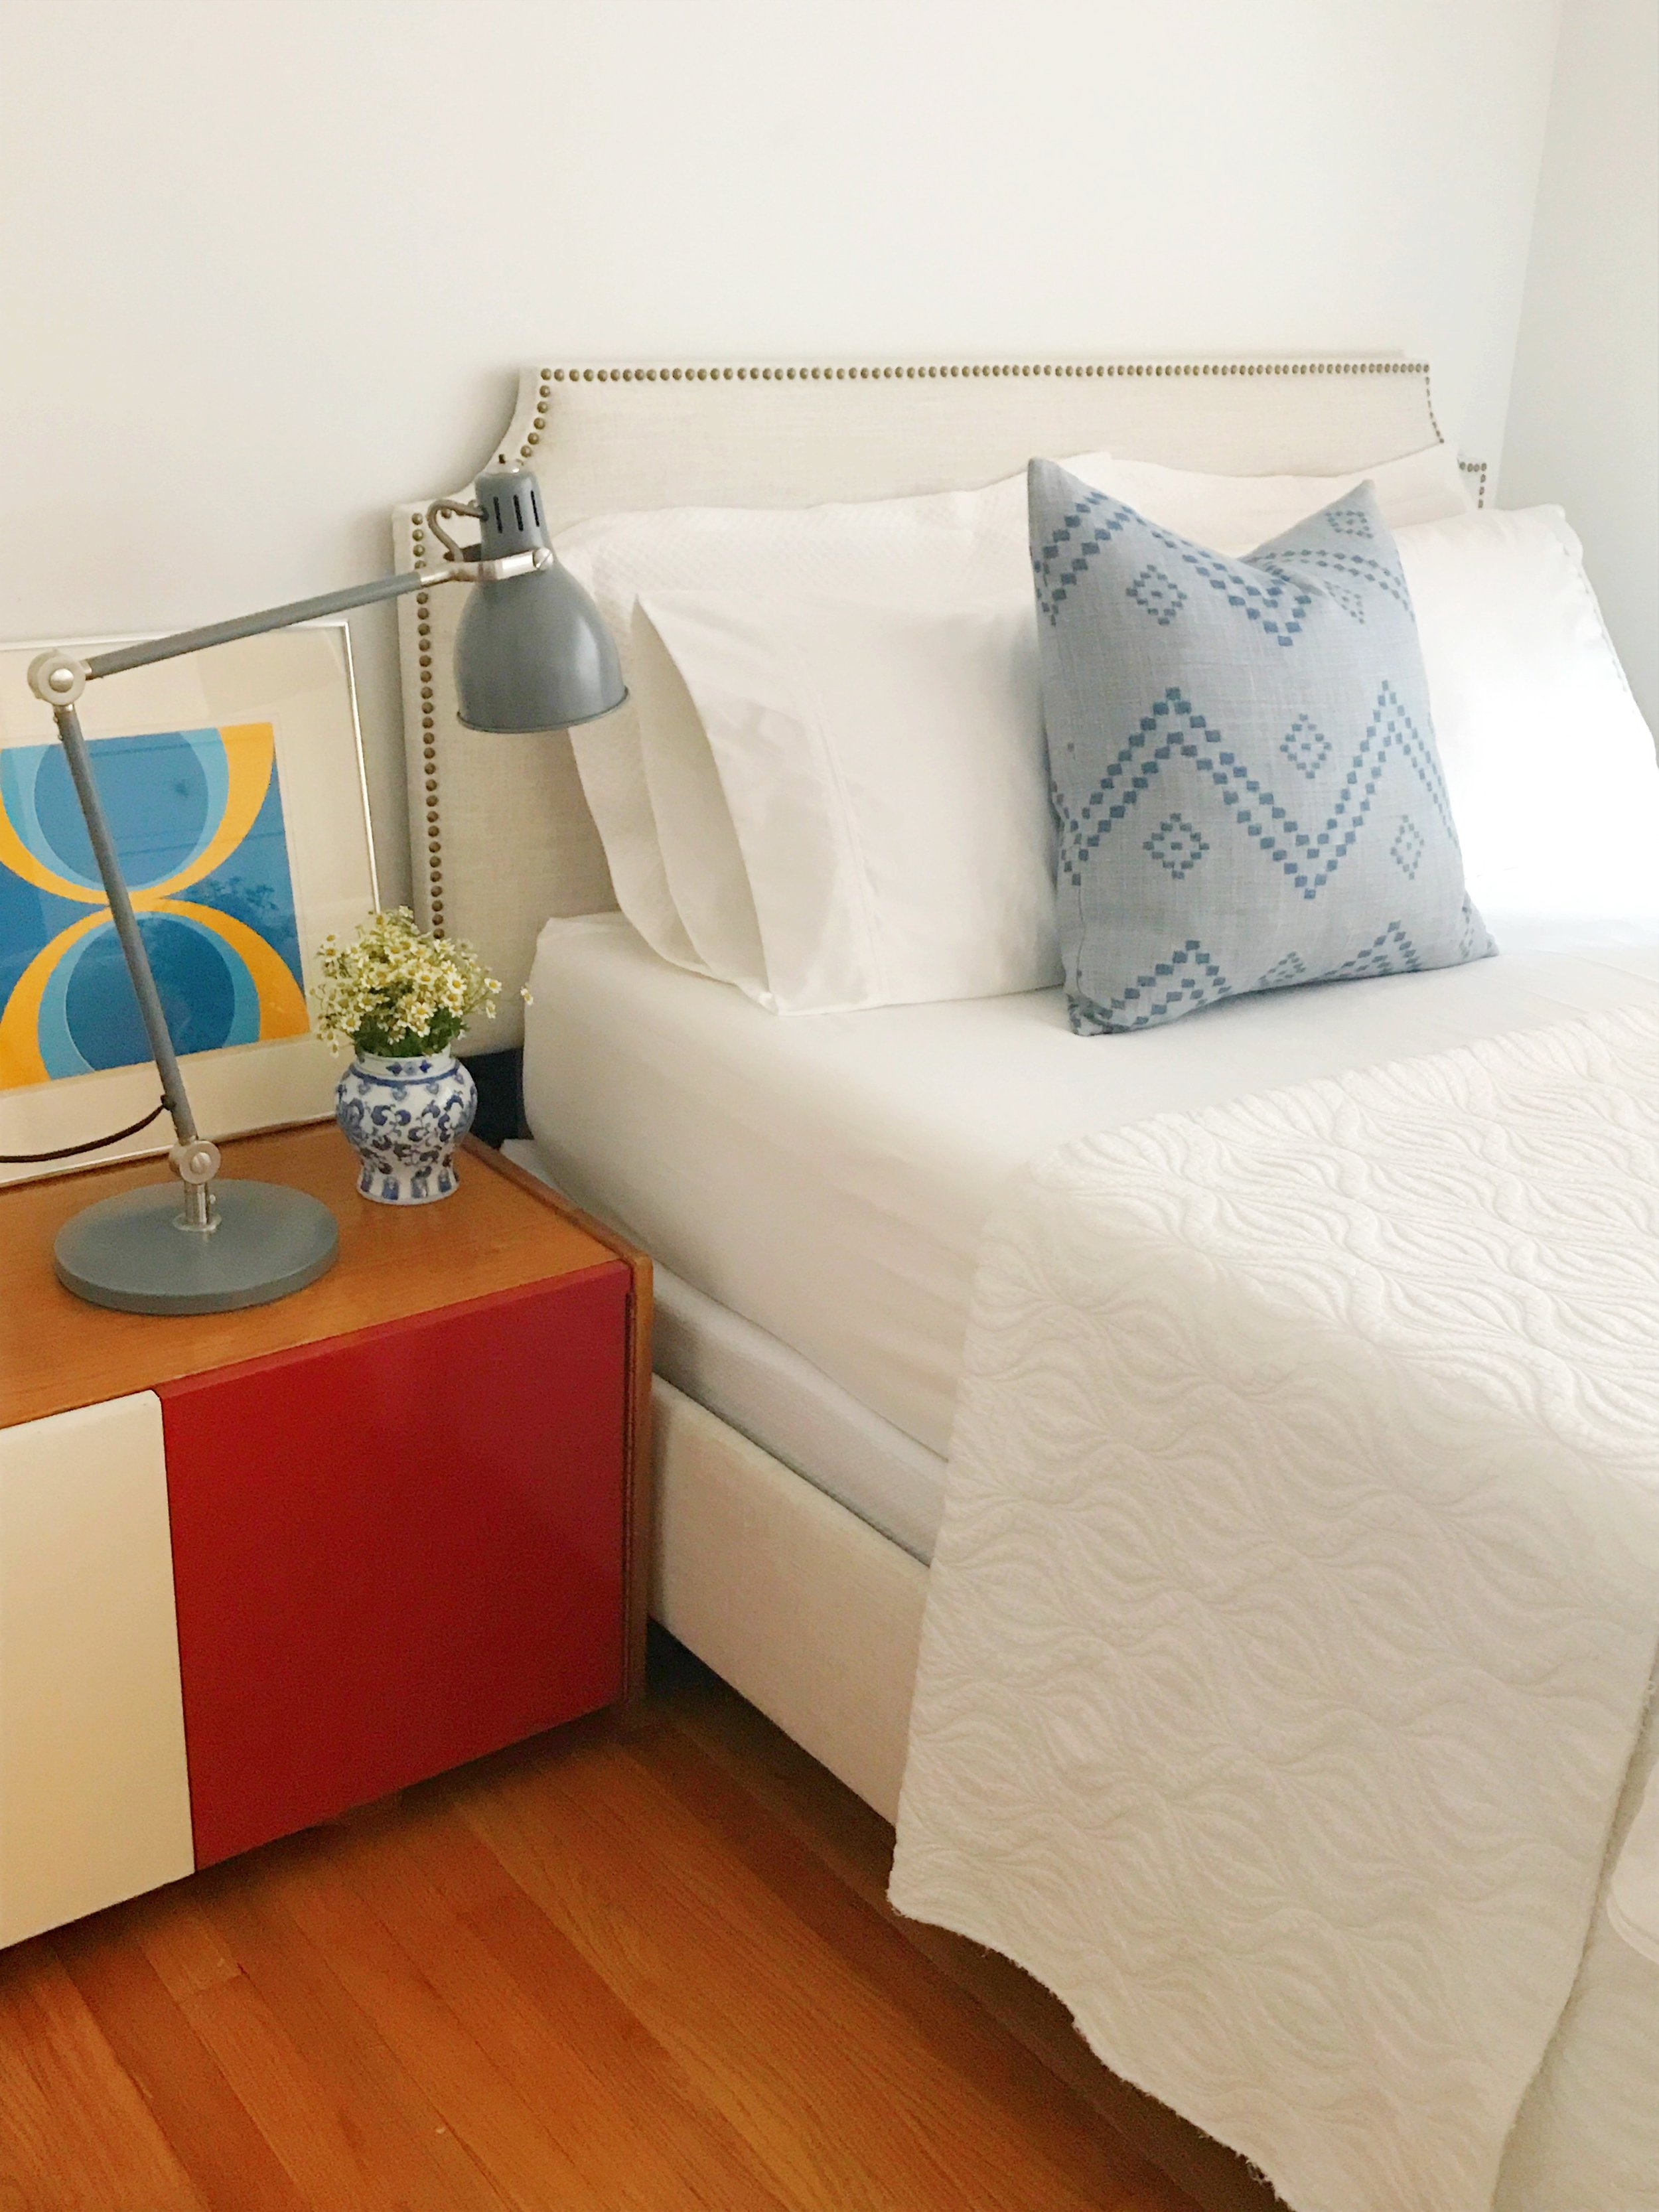 World Market Bed // Pencil & Paper Co.